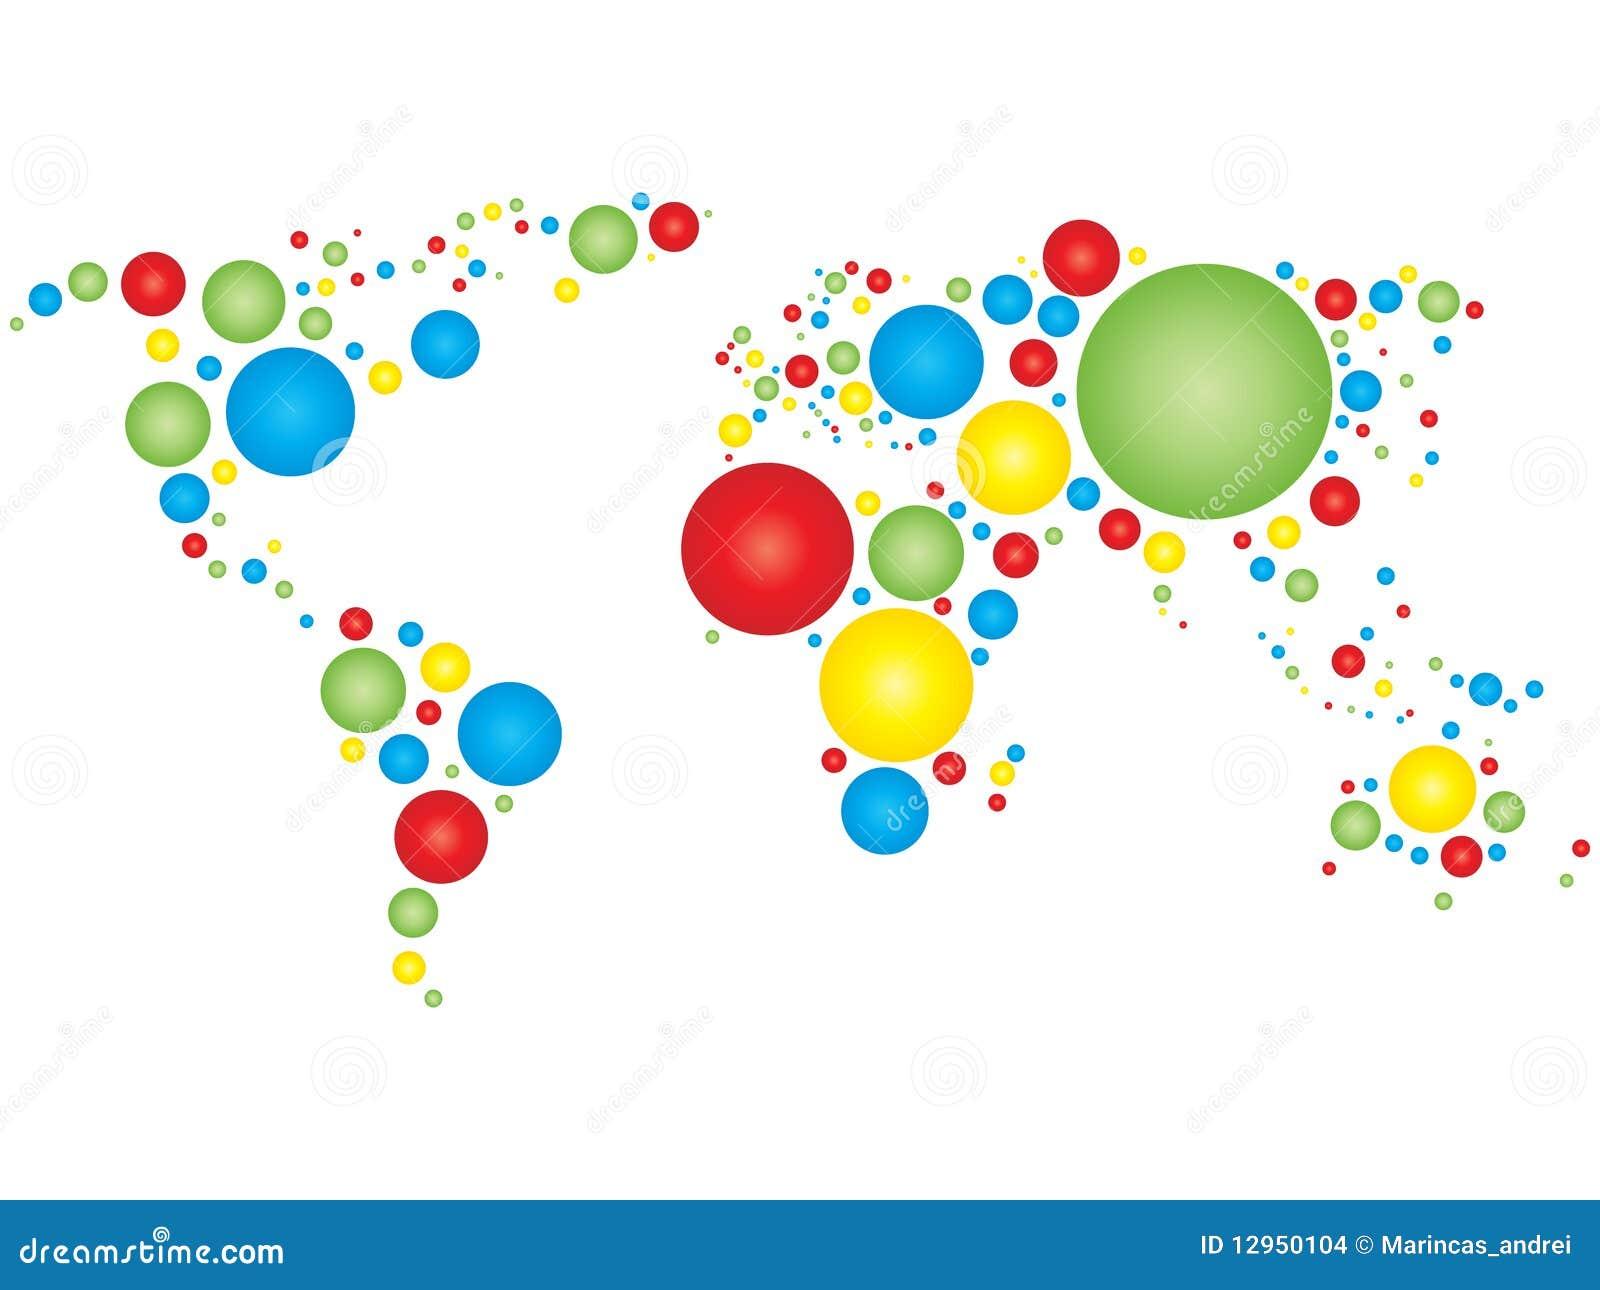 colorful world map stock images image 12950104. Black Bedroom Furniture Sets. Home Design Ideas